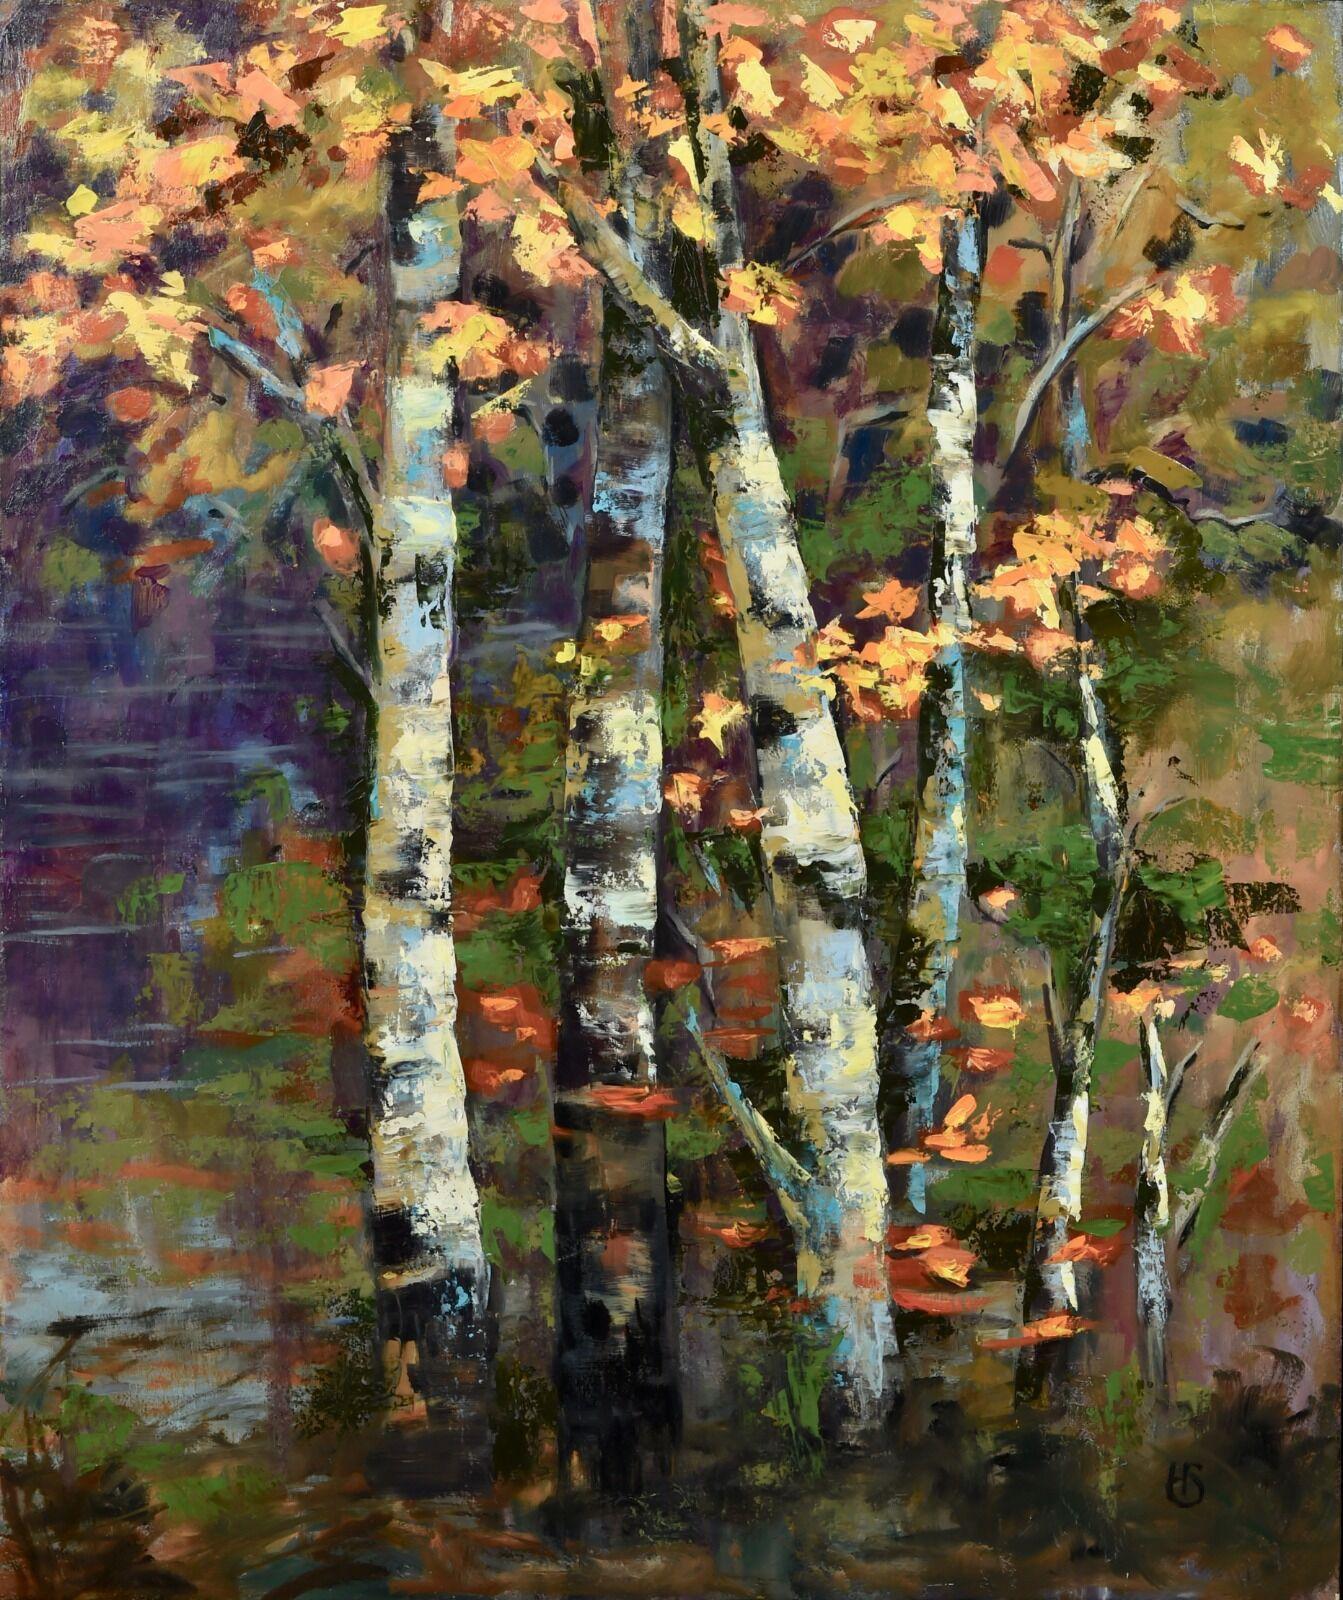 'Autumn Breeze', an original oil painting